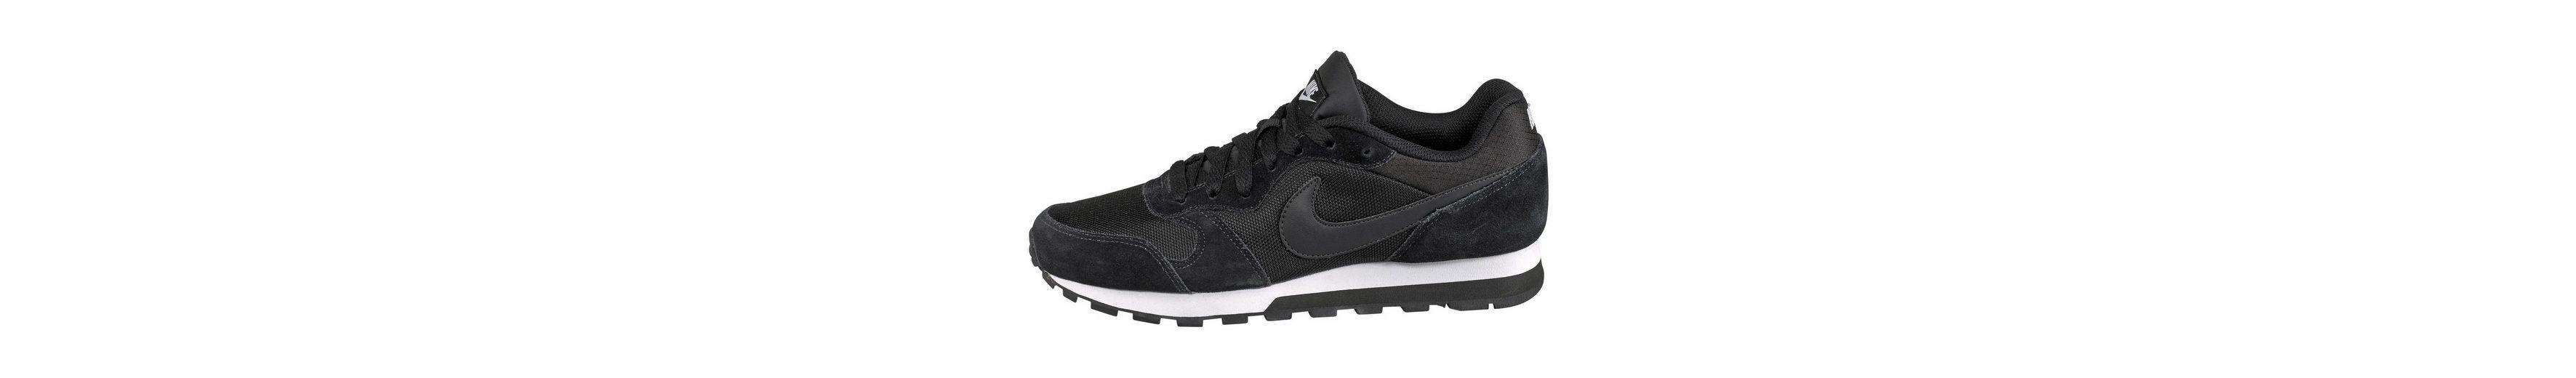 Nike Sportswear MD Runner 2 Wmns Sneaker Wirklich Online Verkauf Echten DBWAy